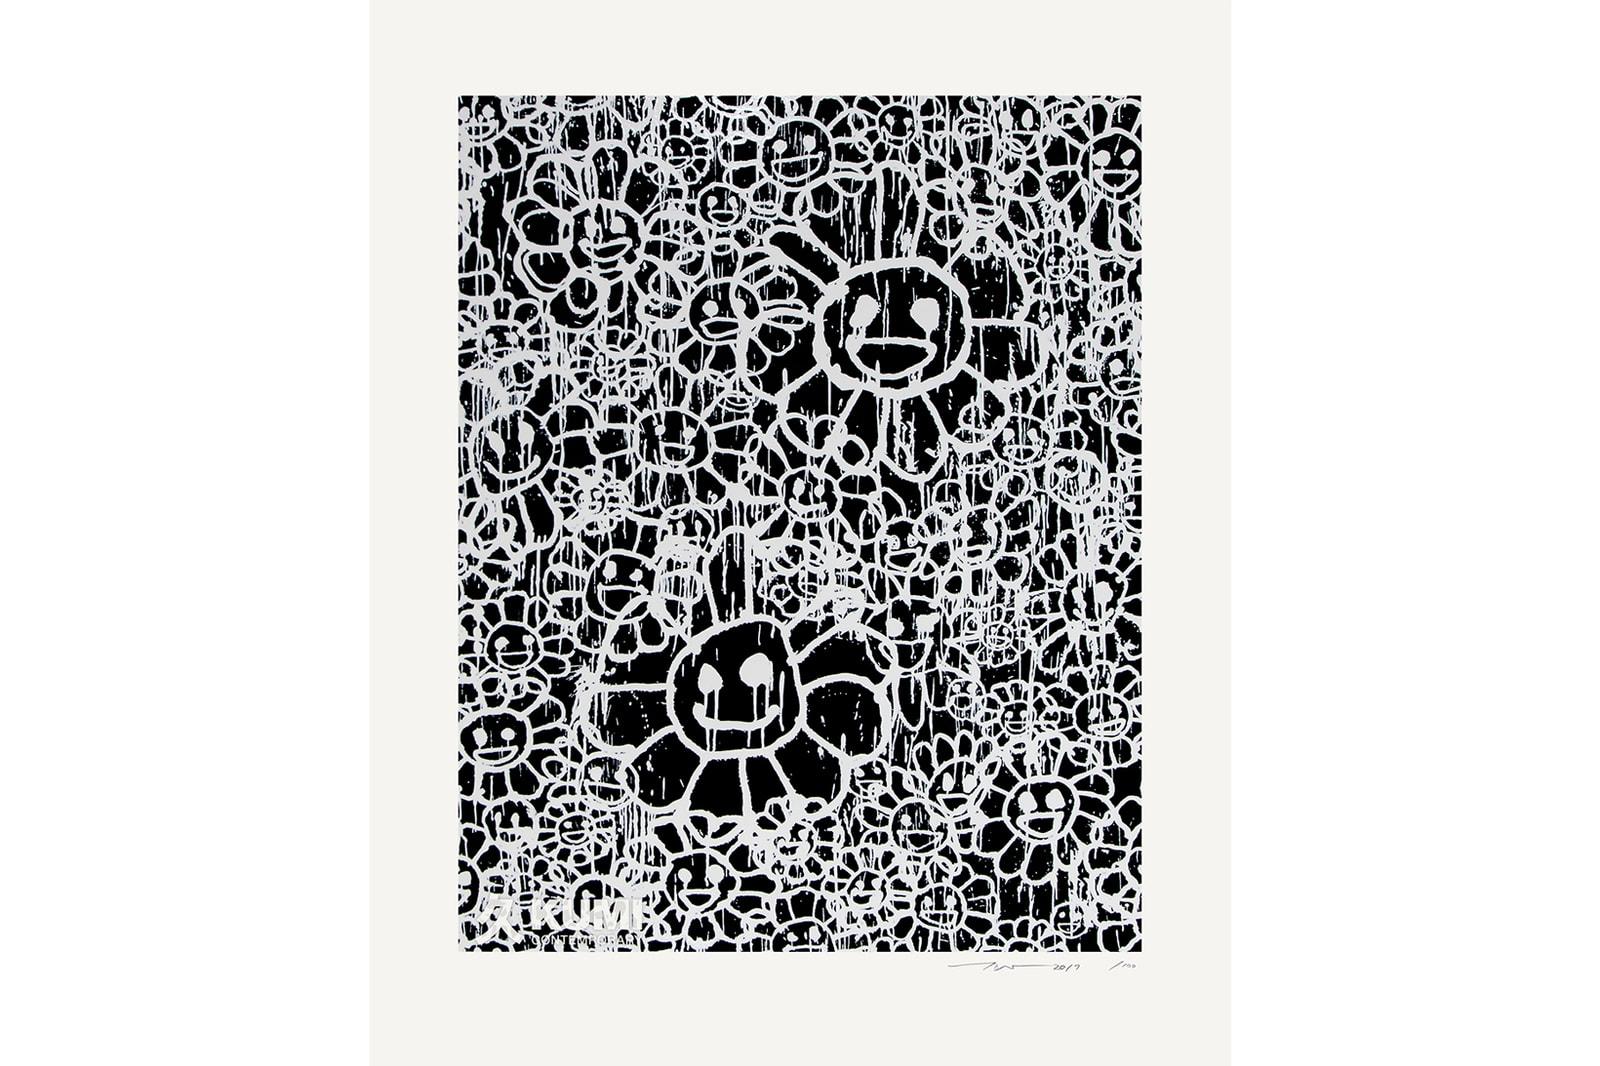 Madsaki kumi contemporary prints artworks beirut youth jey perie gogy esparza dain nyc spoke art the earth powder